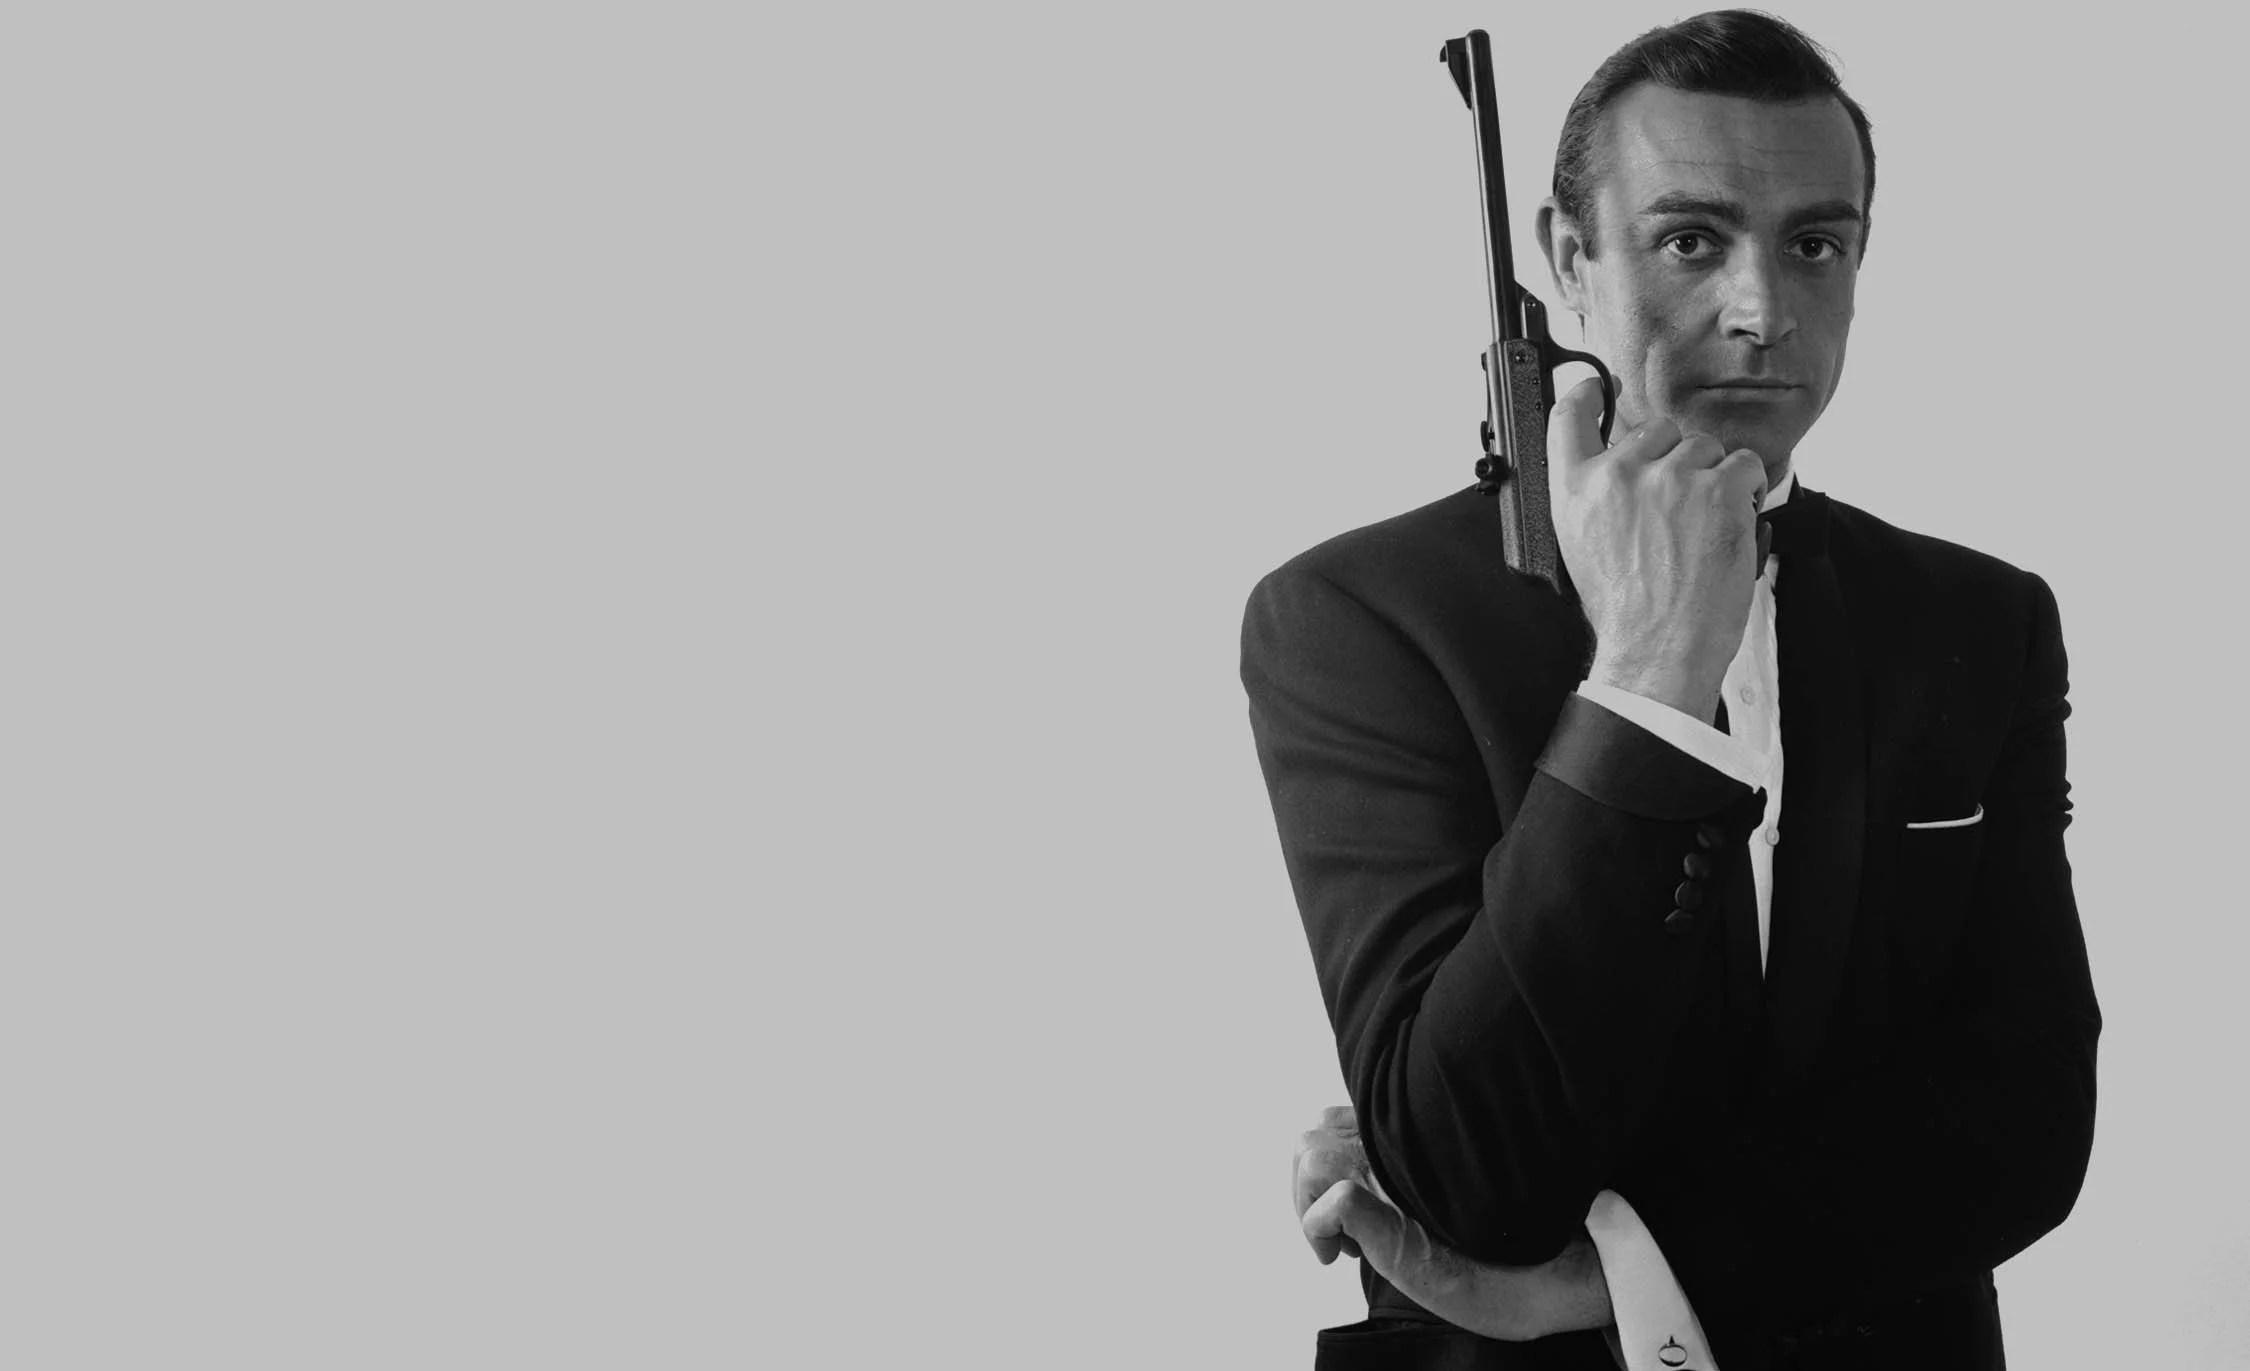 https://i0.wp.com/www.007.com/wp-content/uploads/2014/01/Sean-Connery-james-bond-BW.jpg